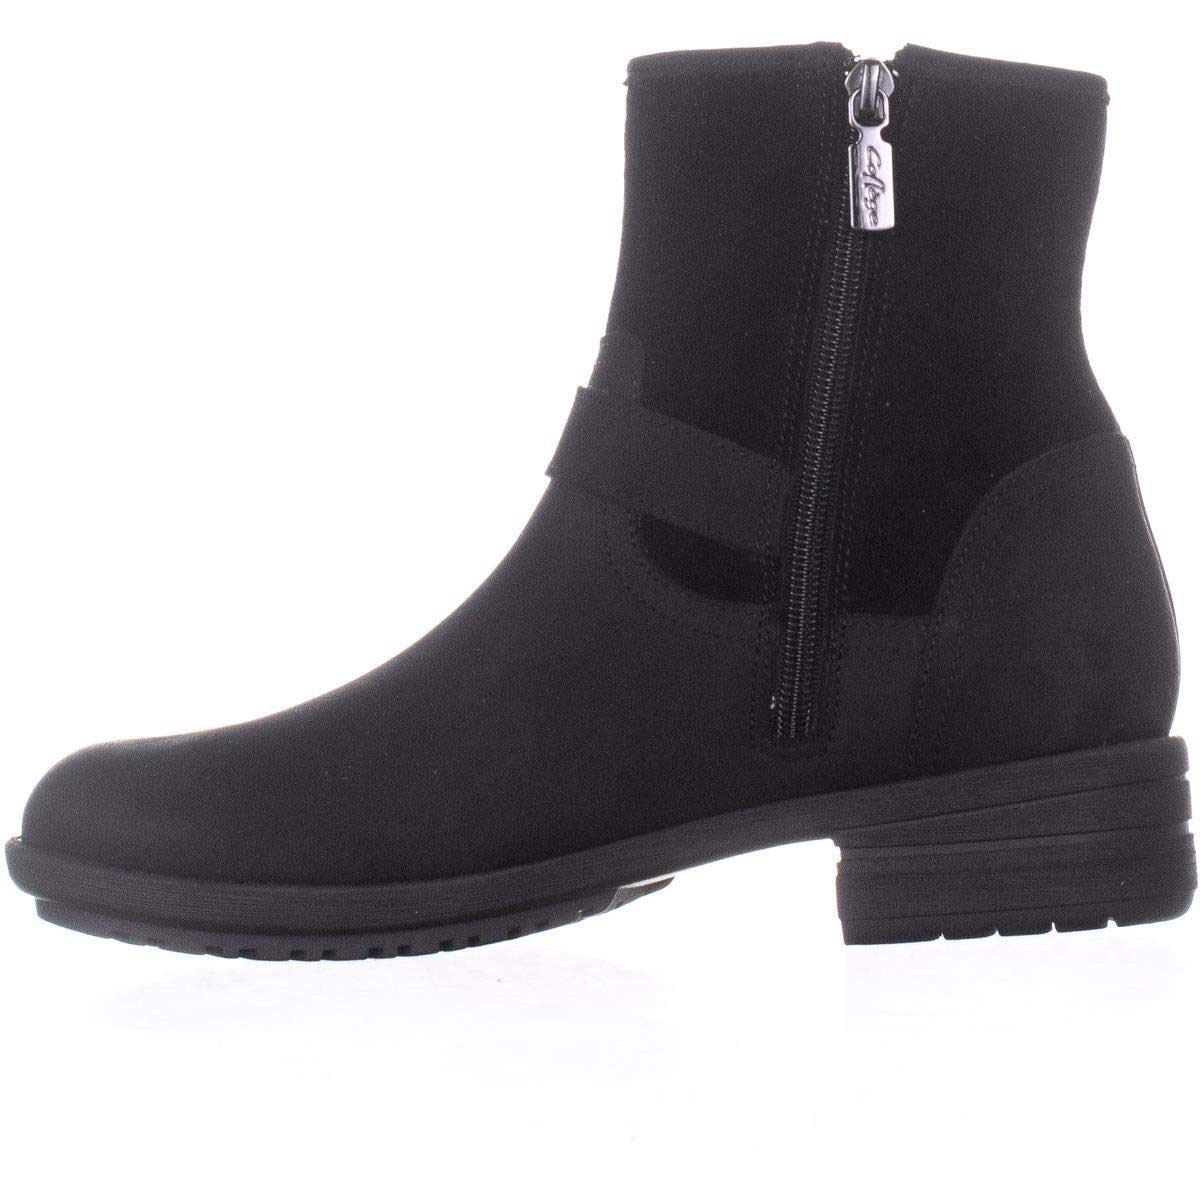 Aqua Womens Taylor Leather Round Toe Ankle Fashion Boots